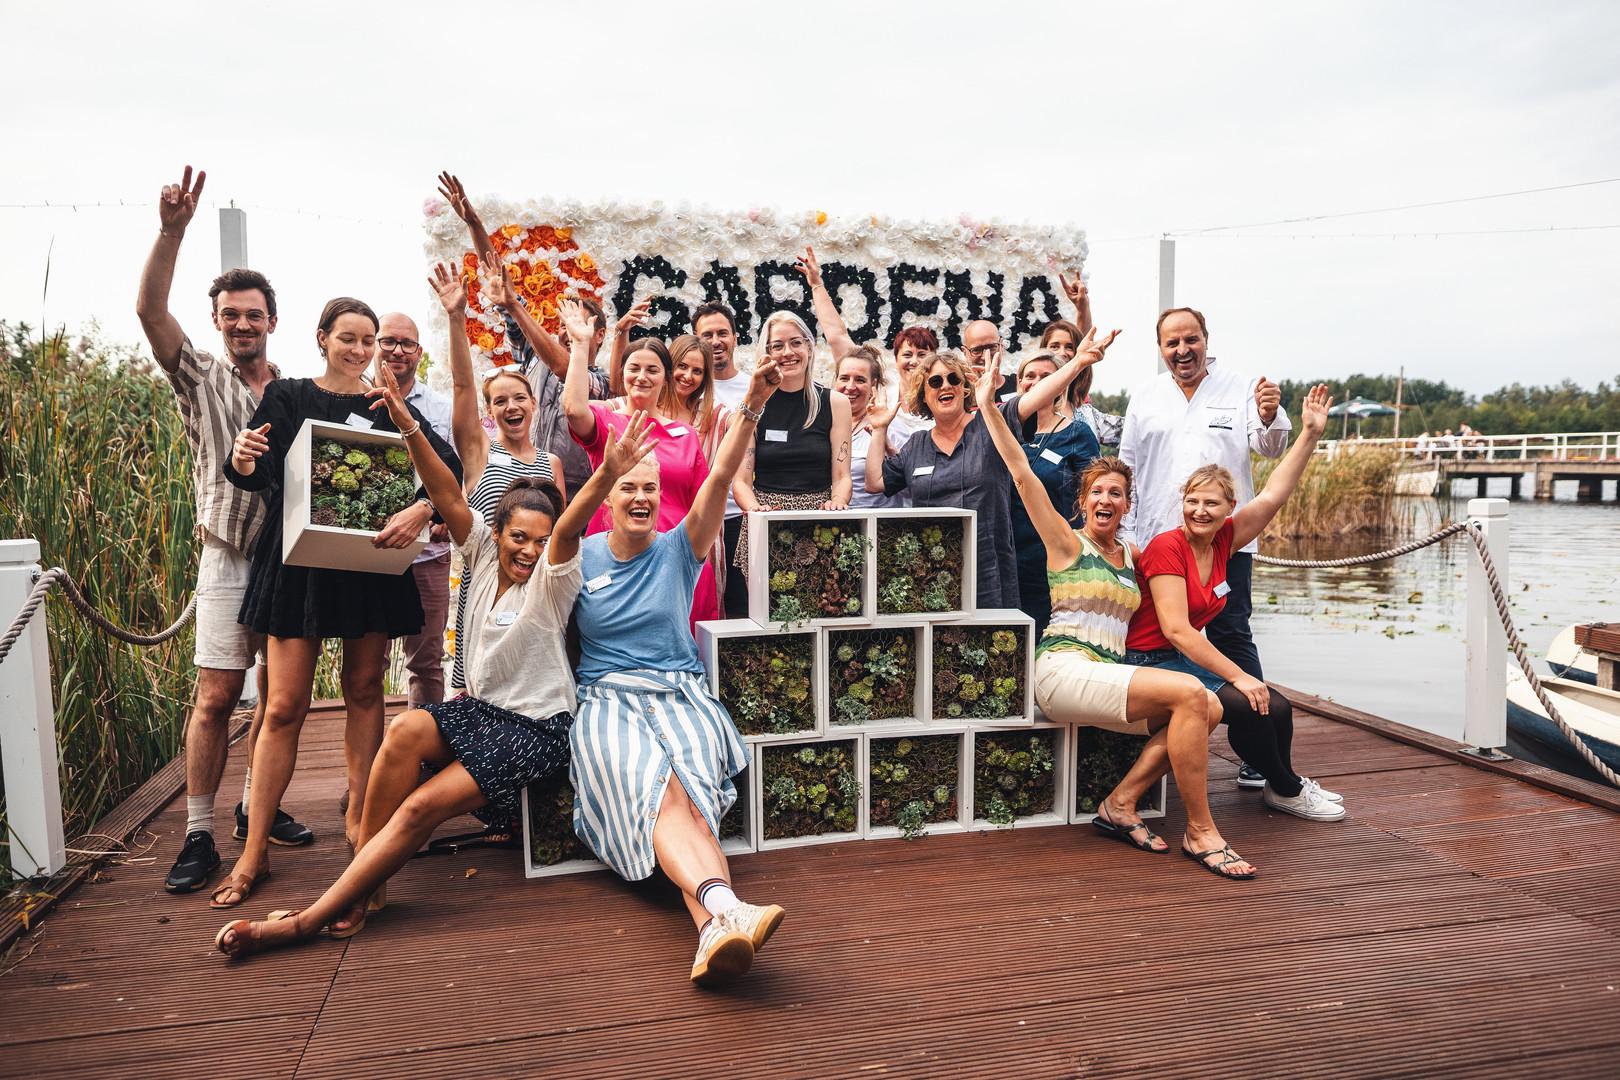 Gardena2019-09-01_15-41-35.jpeg